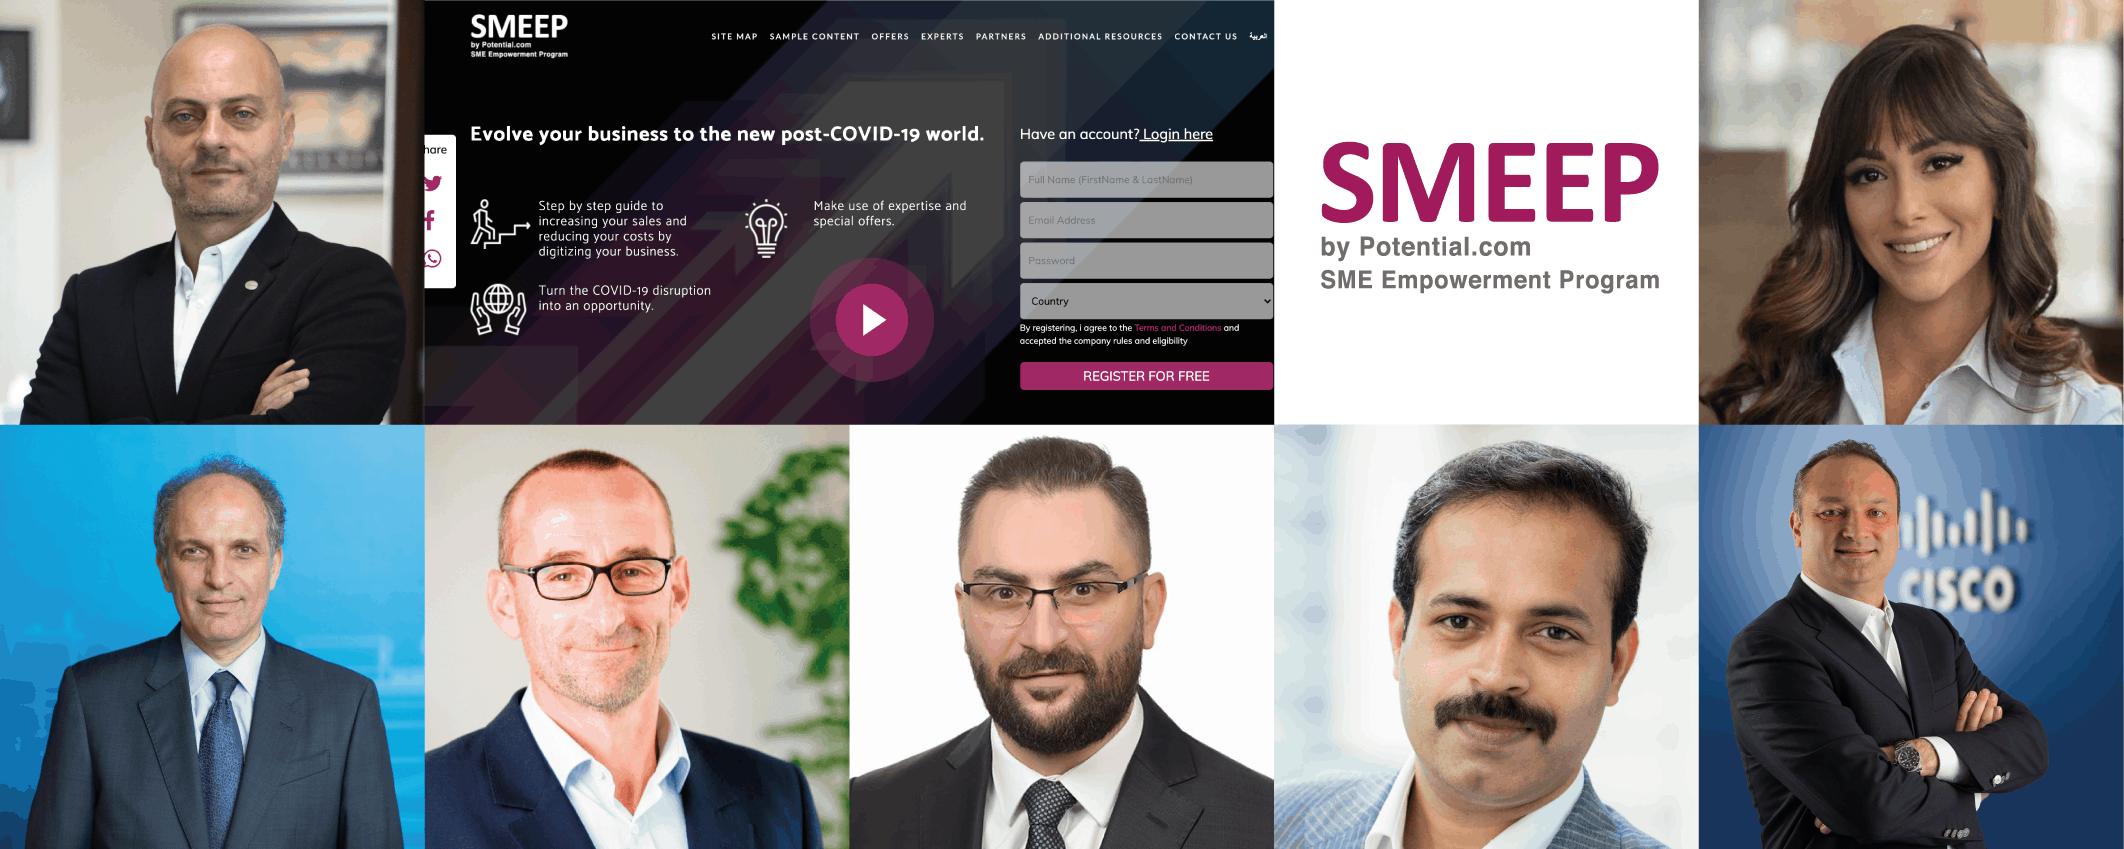 SMEEP launch event speakers